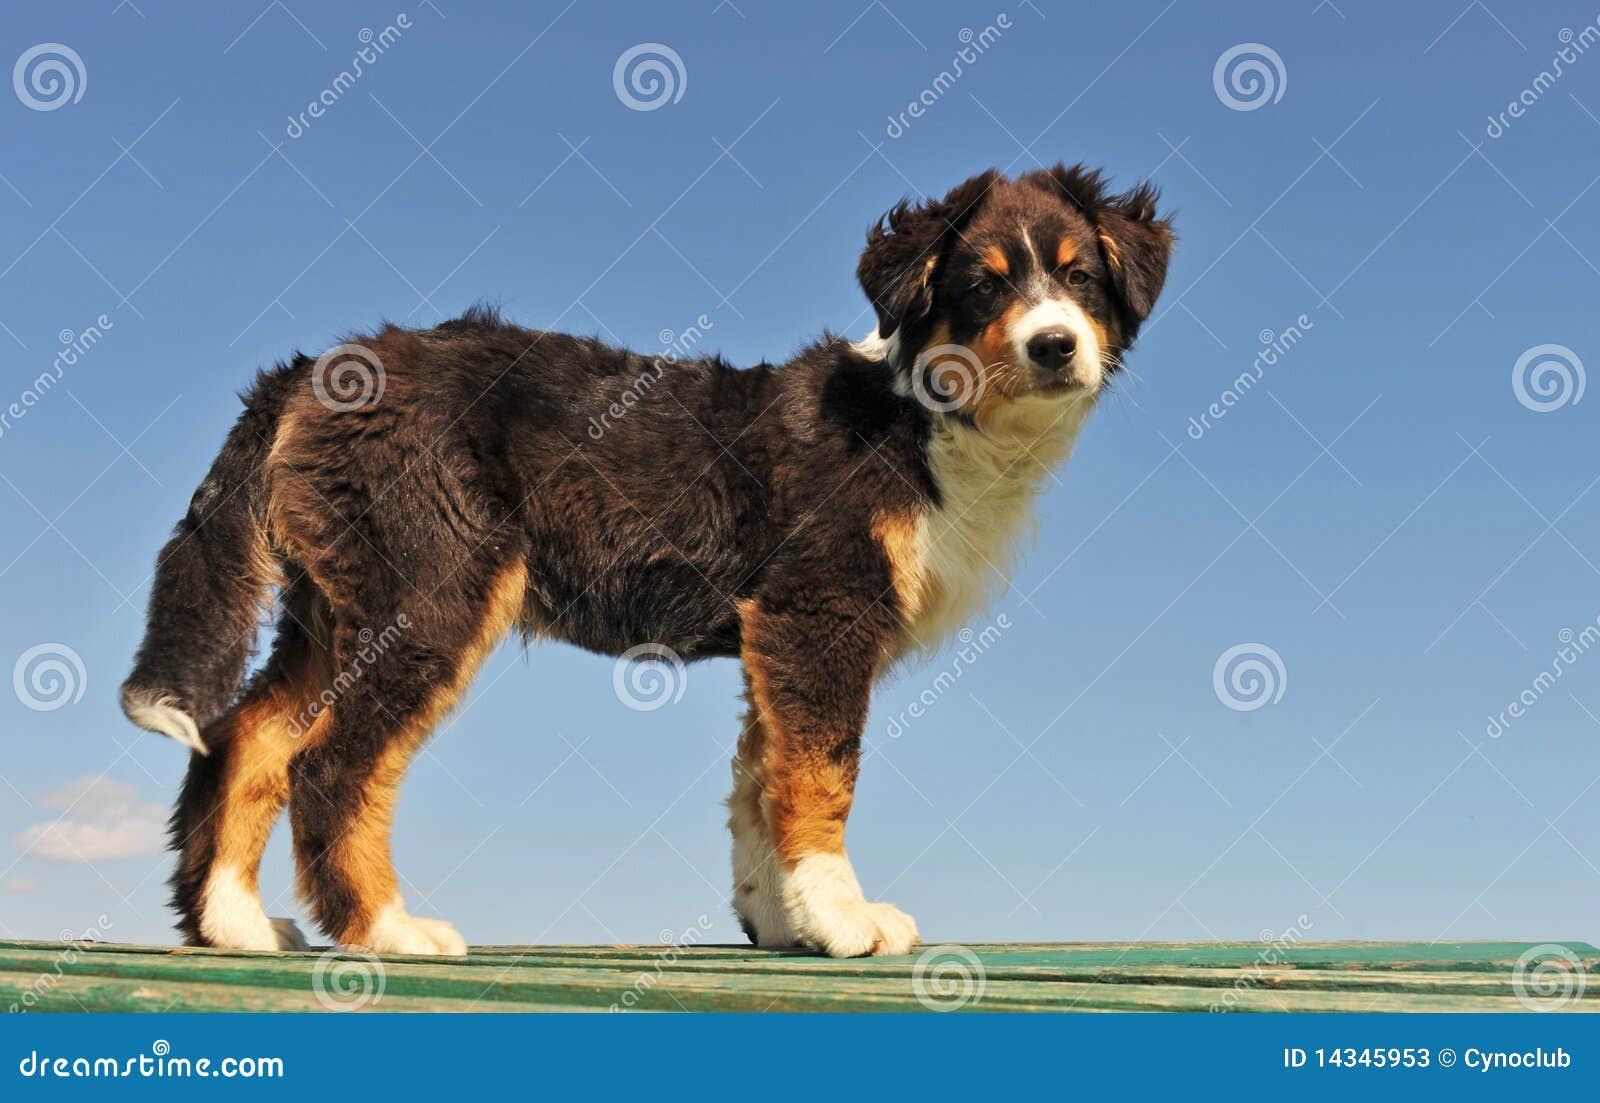 Puppy Australian Shepherd Stock Photos - Image: 14345953